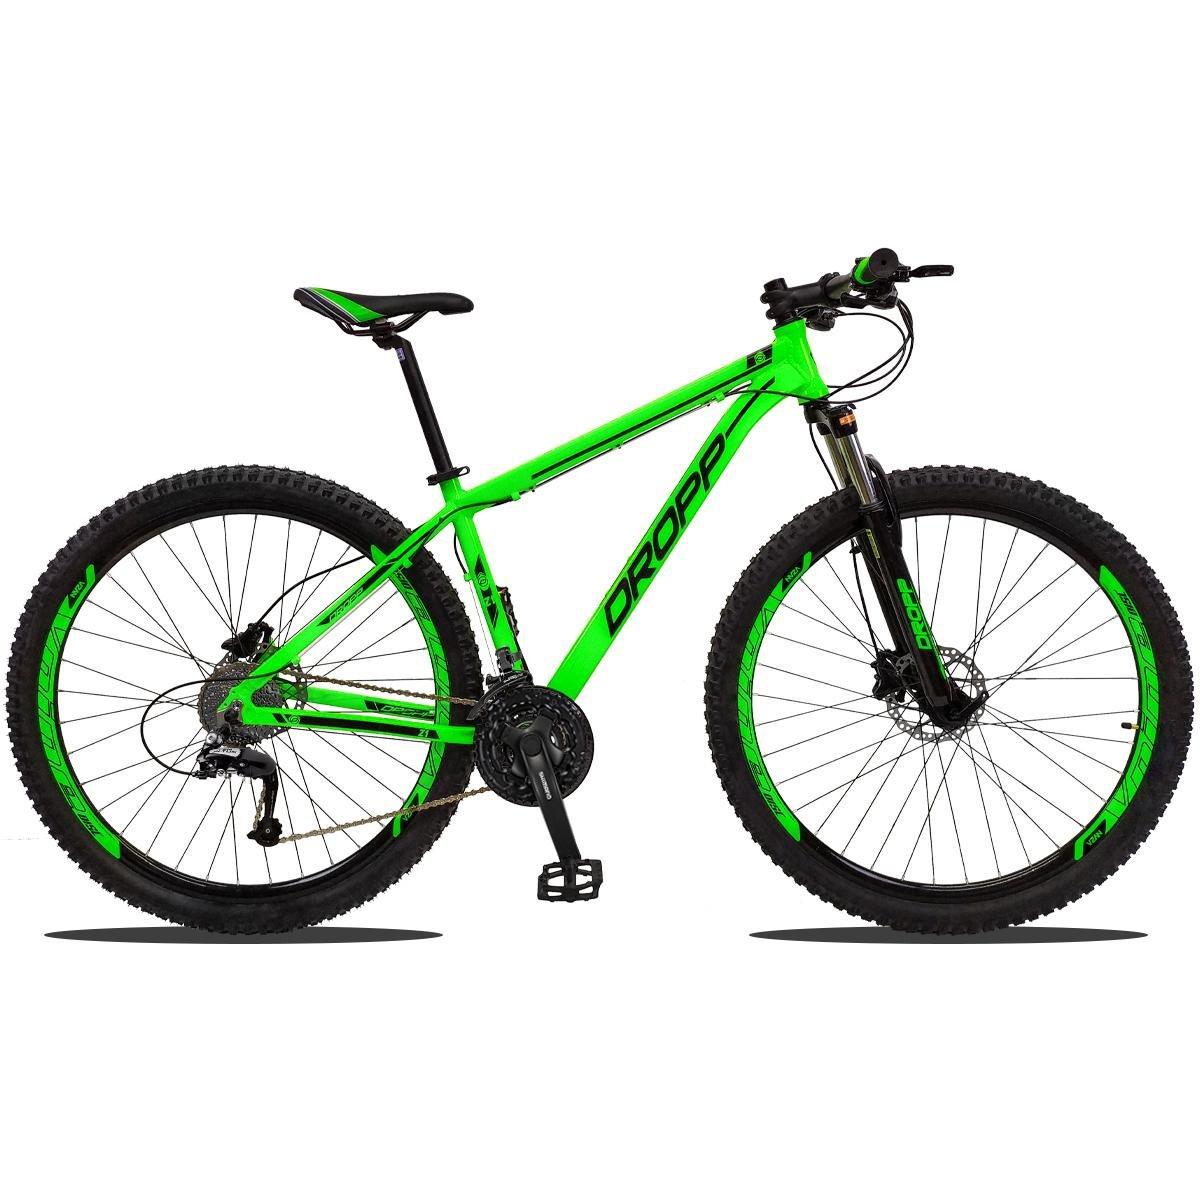 Bicicleta Dropp Z1 T21 Aro 29 Susp. Dianteira 27 Marchas - Verde